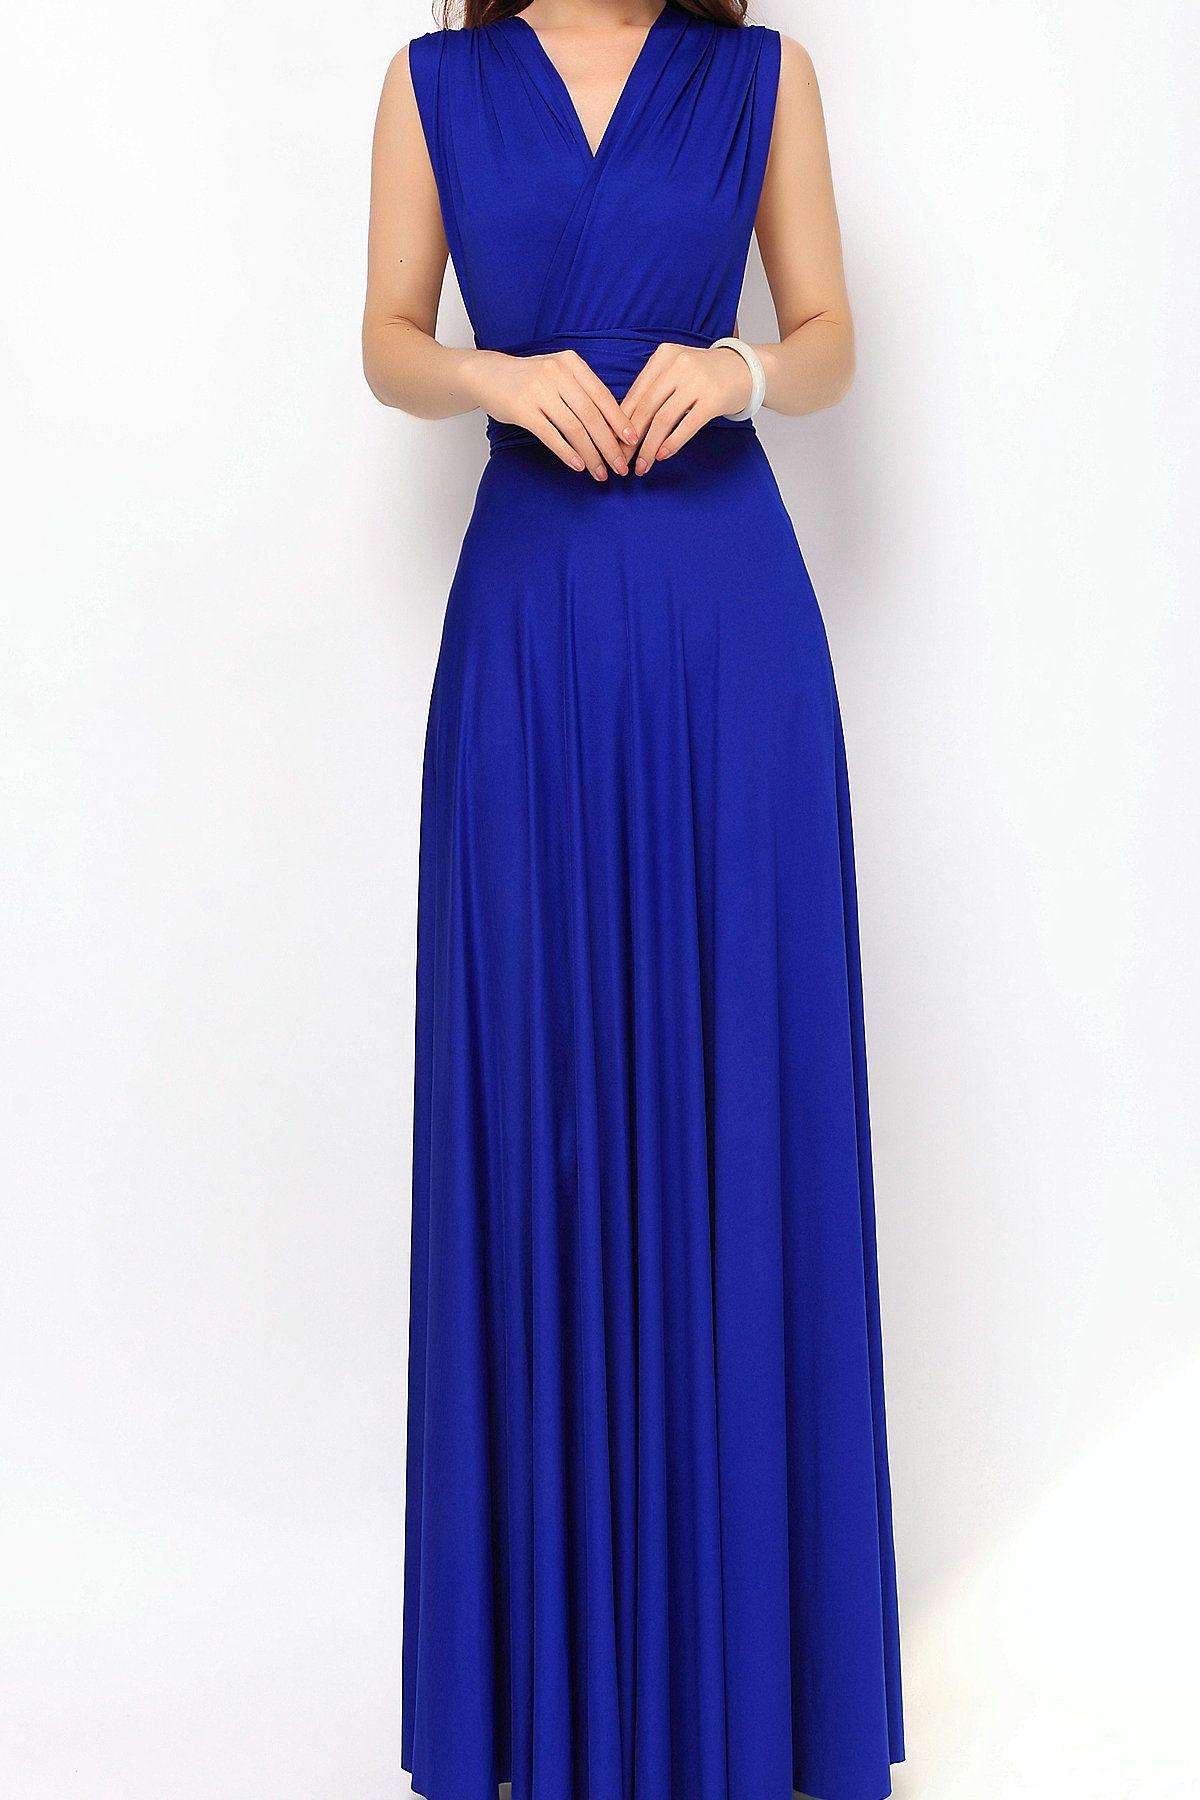 64369ea64c7 Royal Blue Maxi Bridesmaid Dresses Infinity Dress Convertible Dr  lg-23  -   73.80   Infinity Dress